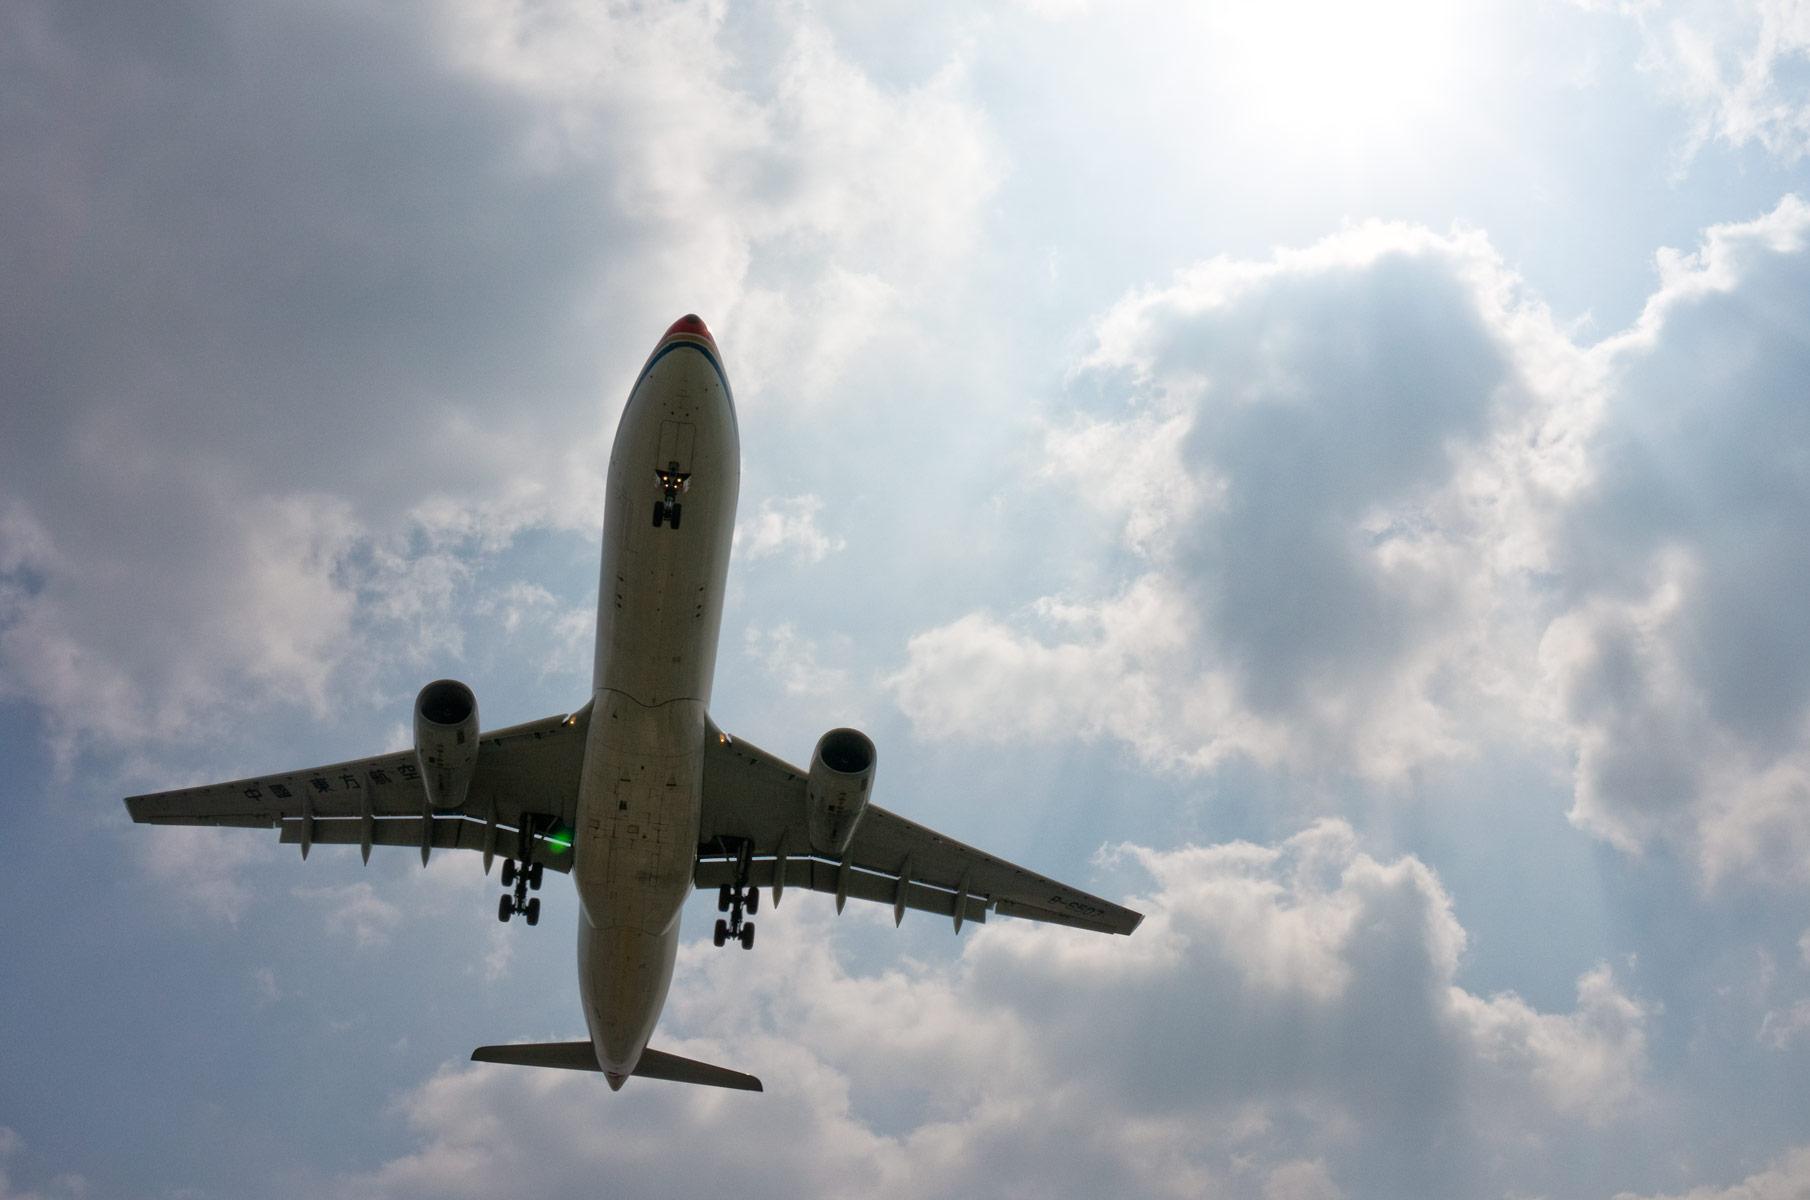 Flugzeug im Landeanflug am Shanghai Hongqiao International Airport